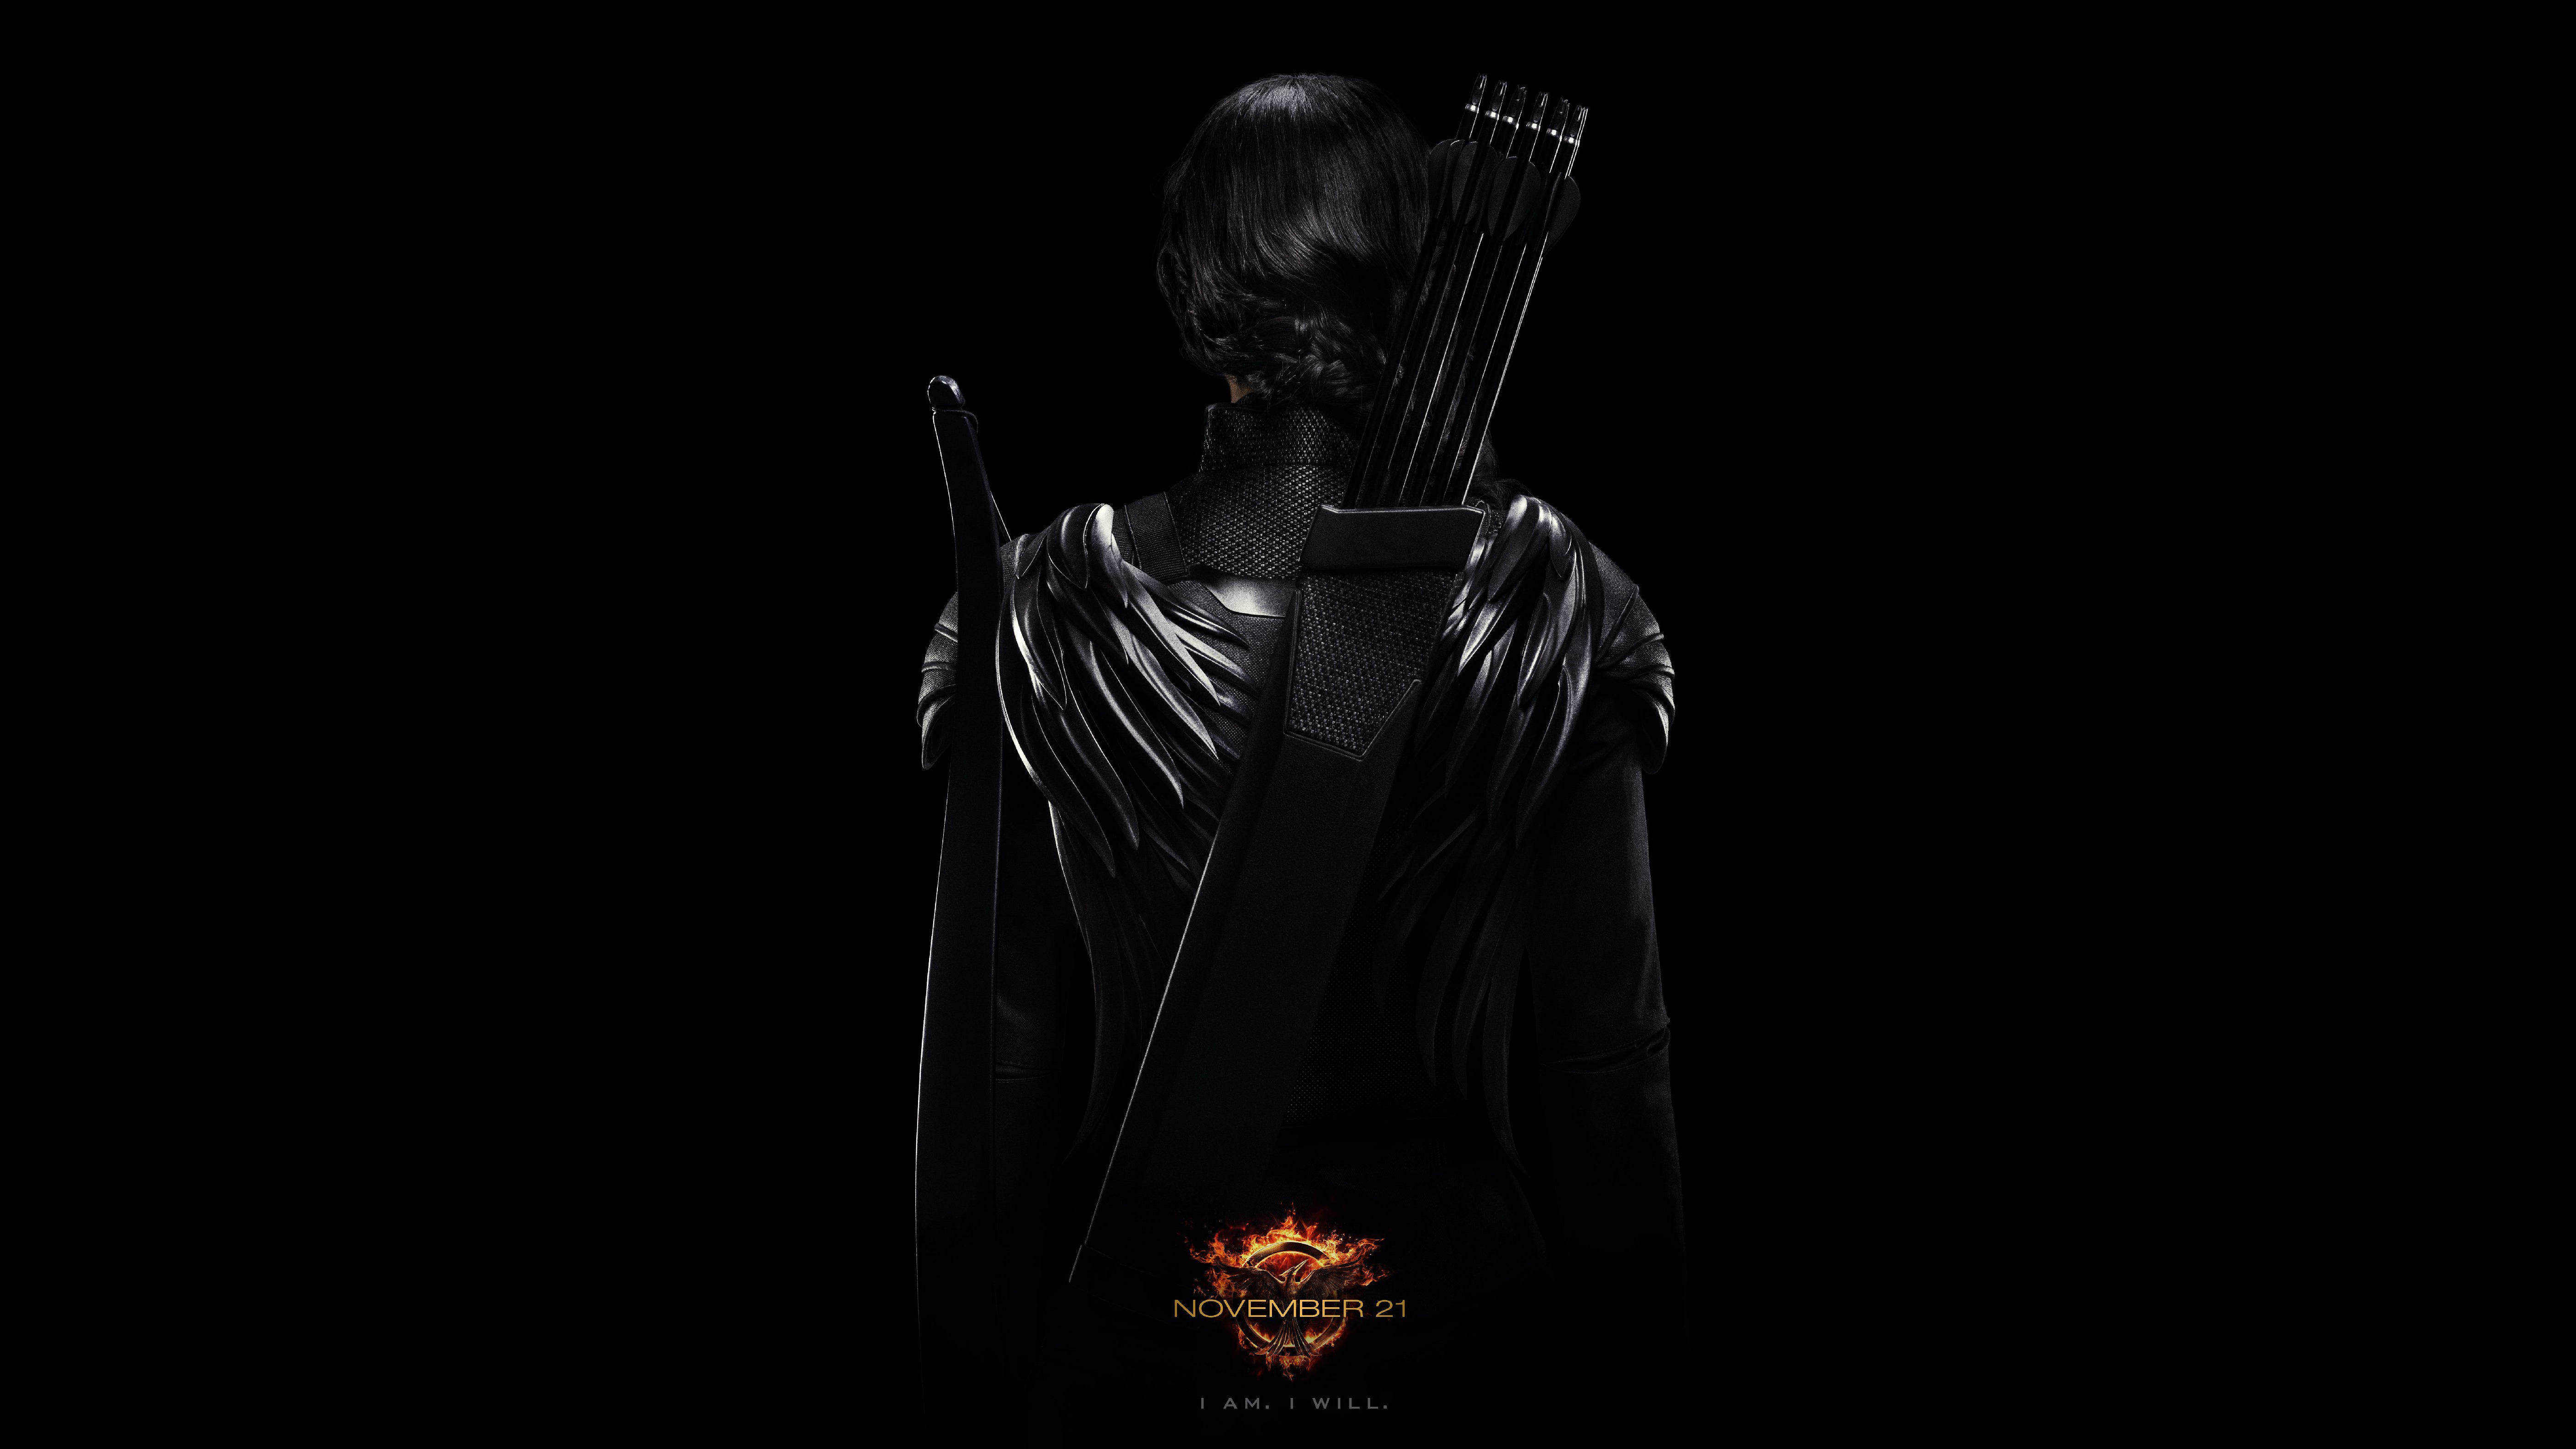 Mockingjay The Hunger Games wallpaper HD